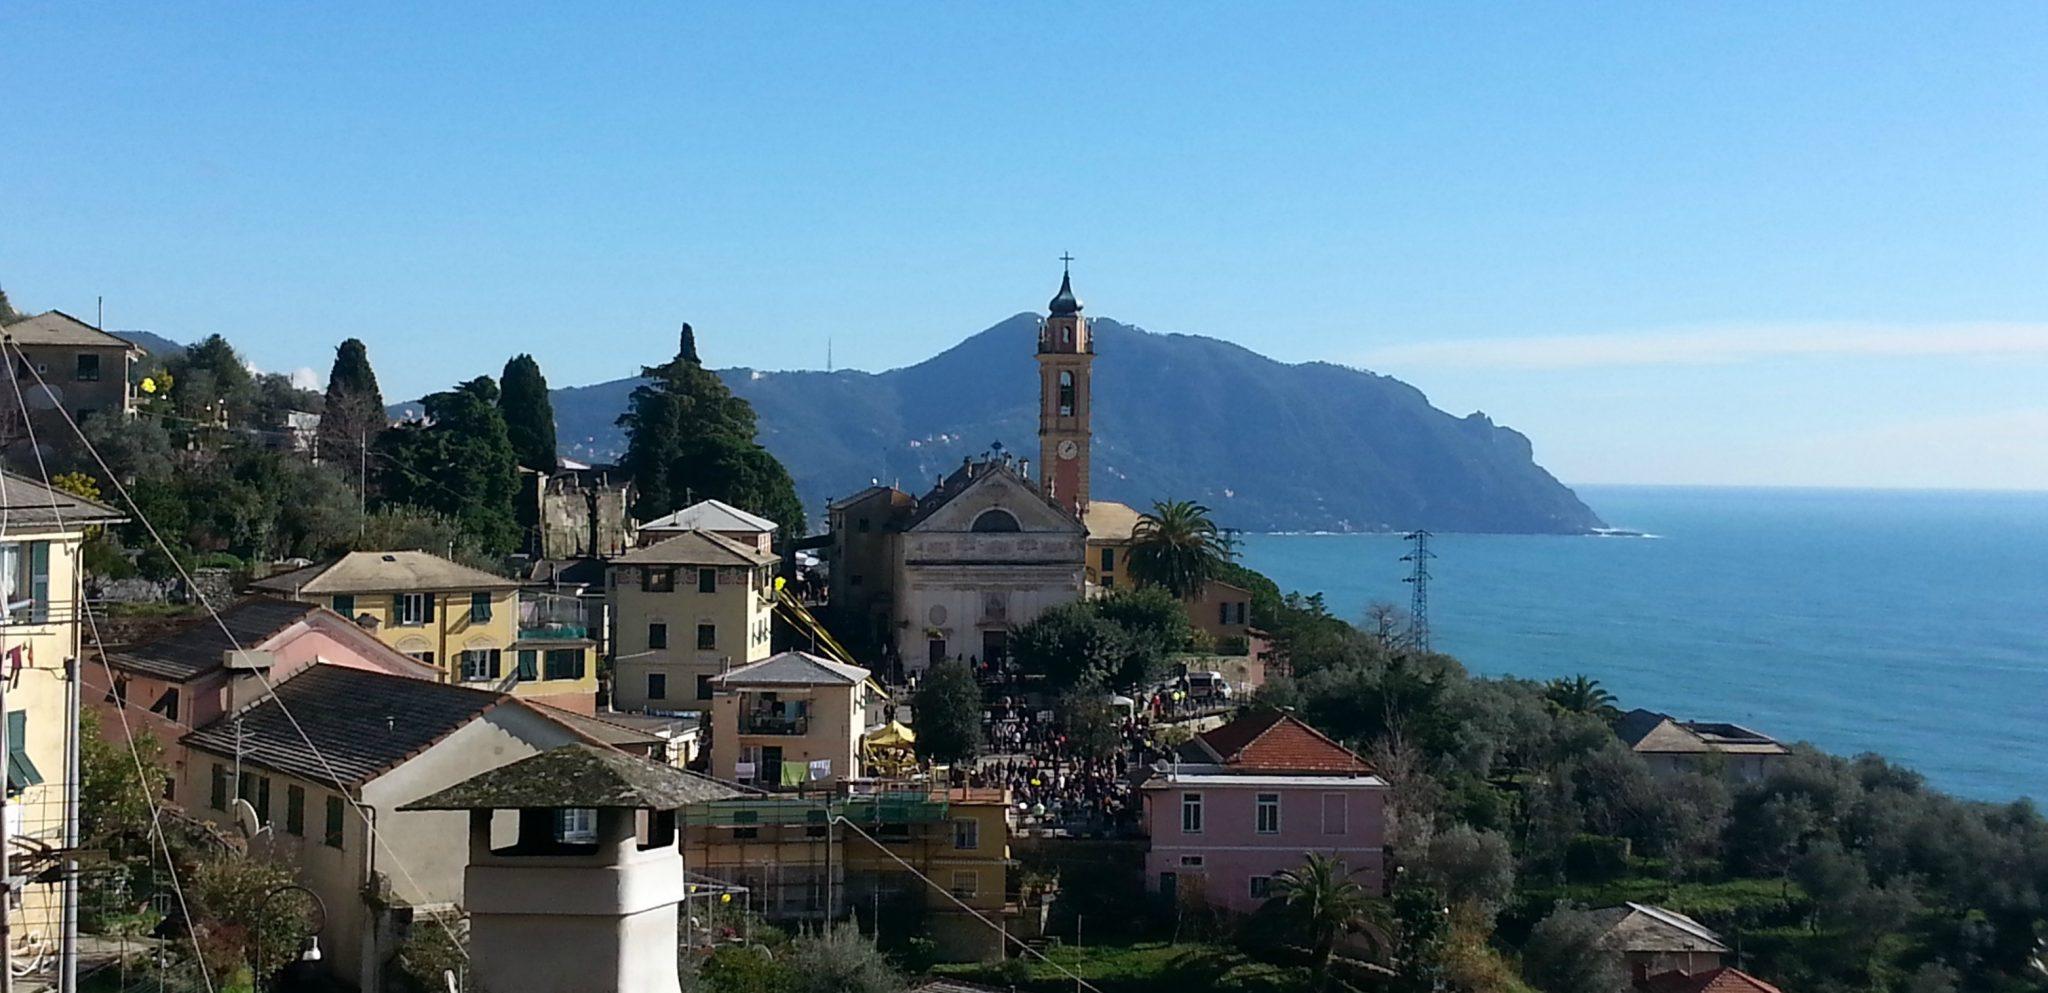 The village of Pieve Ligure